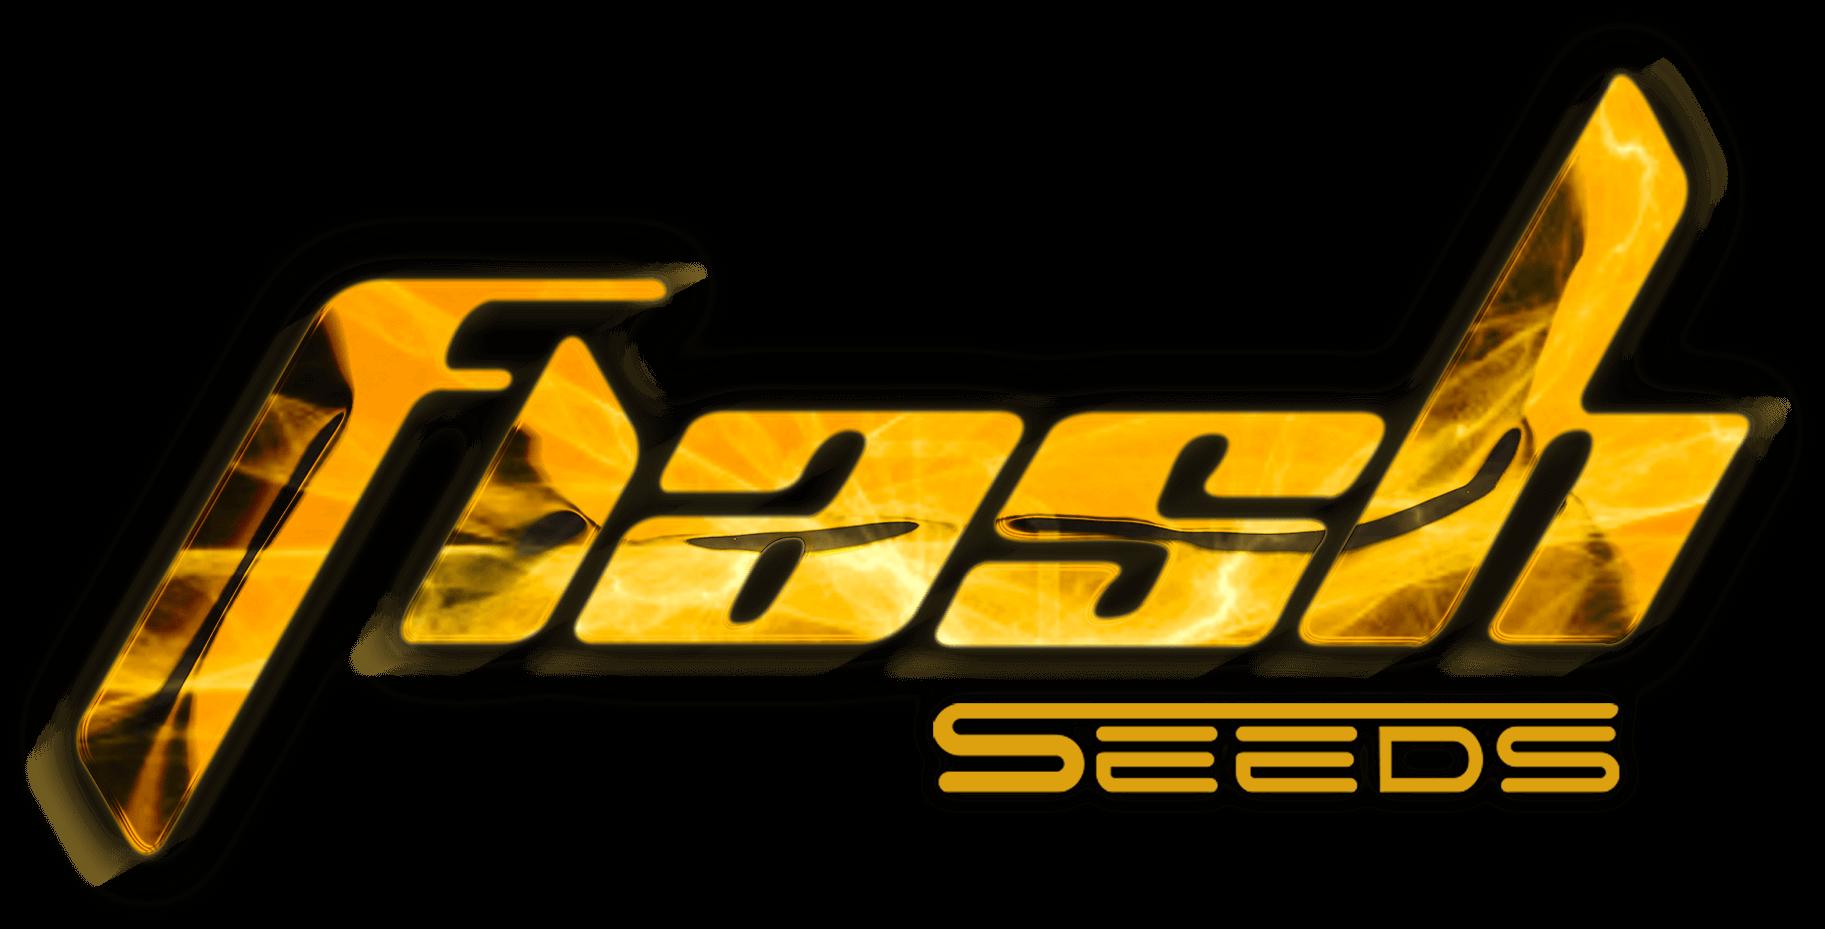 https://flashseedsbank.com/wp-content/uploads/2021/04/logo.png